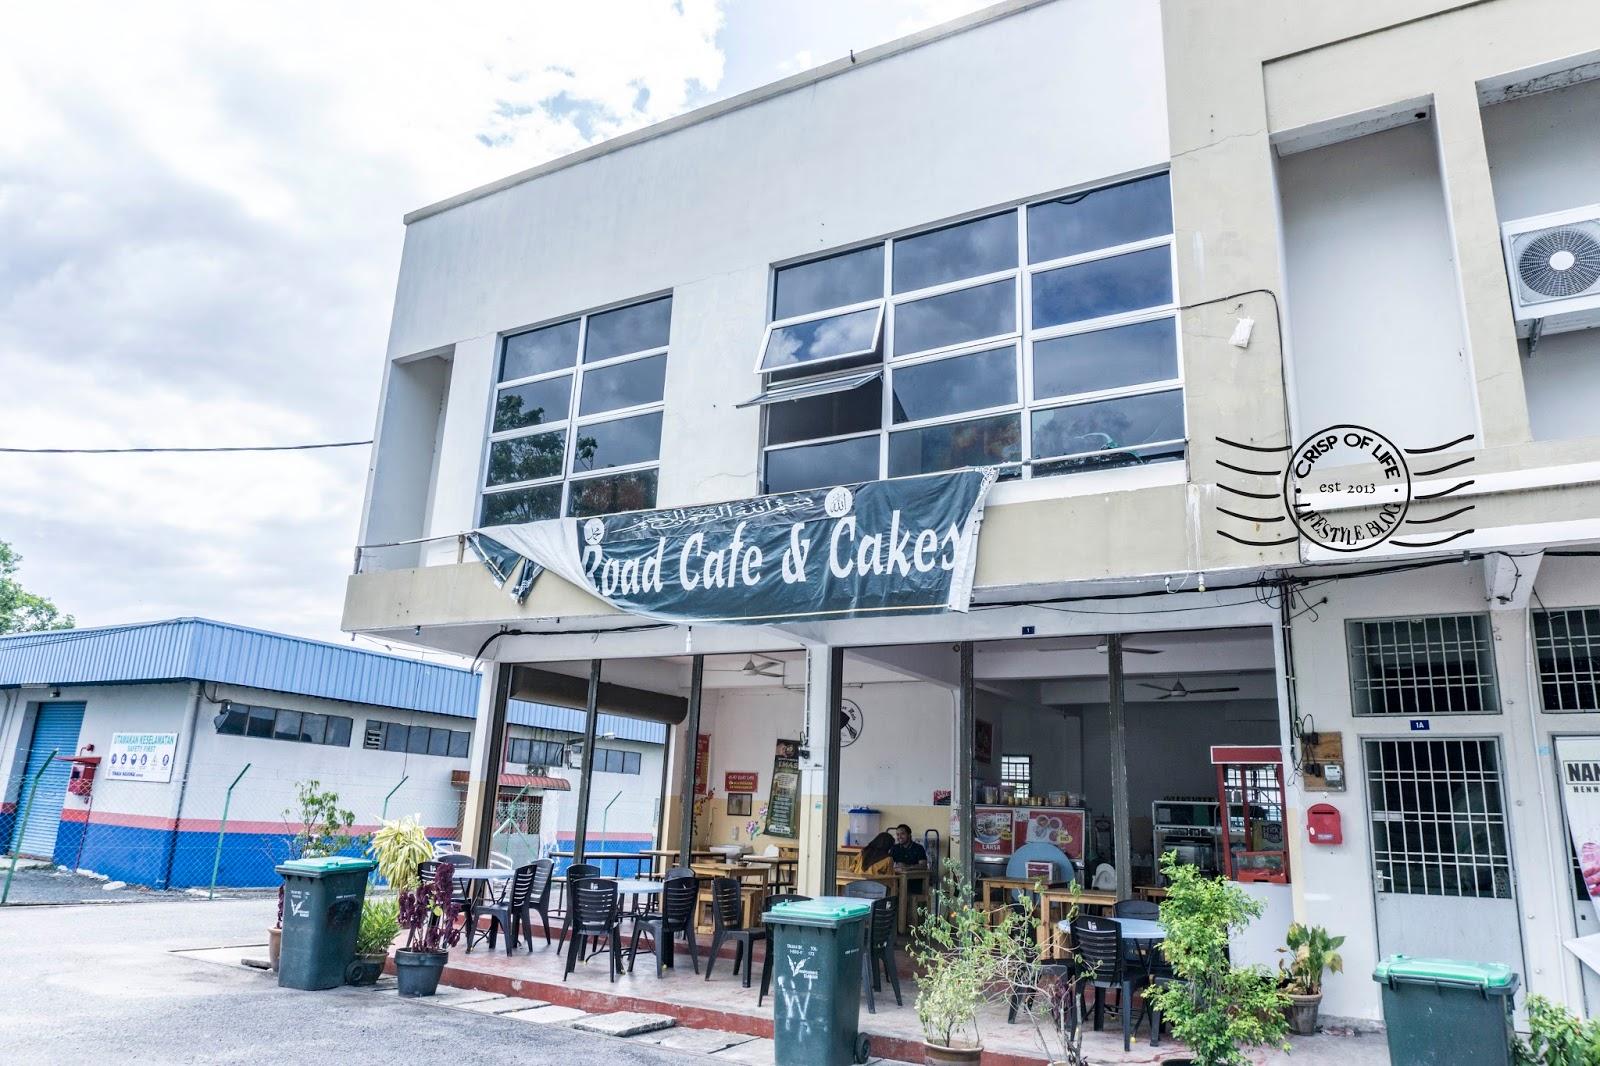 Cendol Durian & Pelam @ Head Road Cafe & Cake, Kepala Batas, Kedah